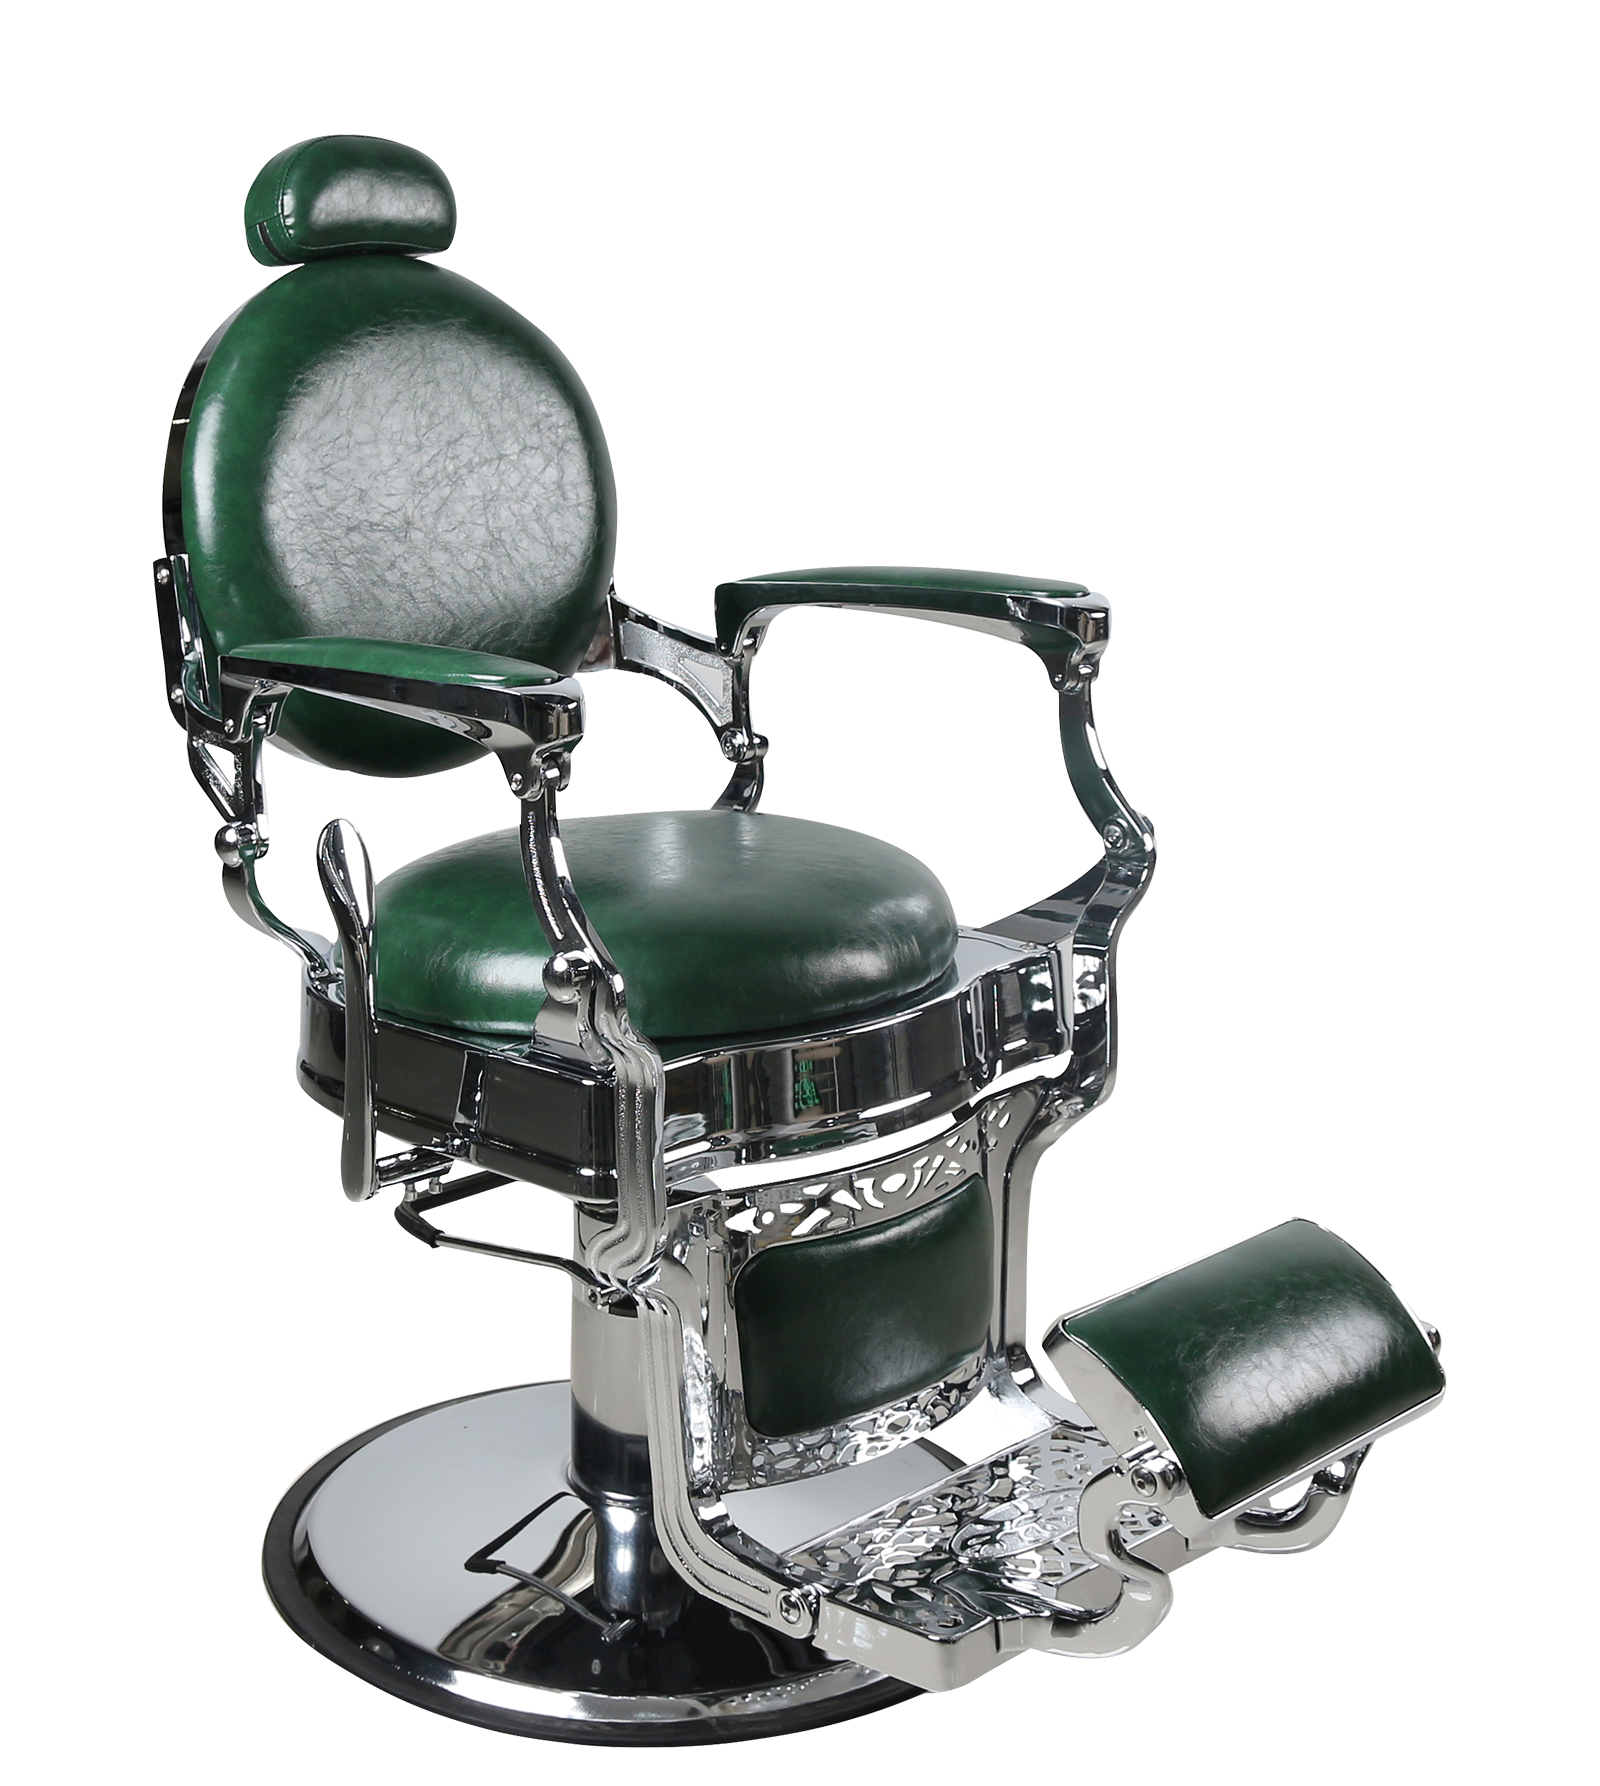 Barber Chair TOM i GRÖN